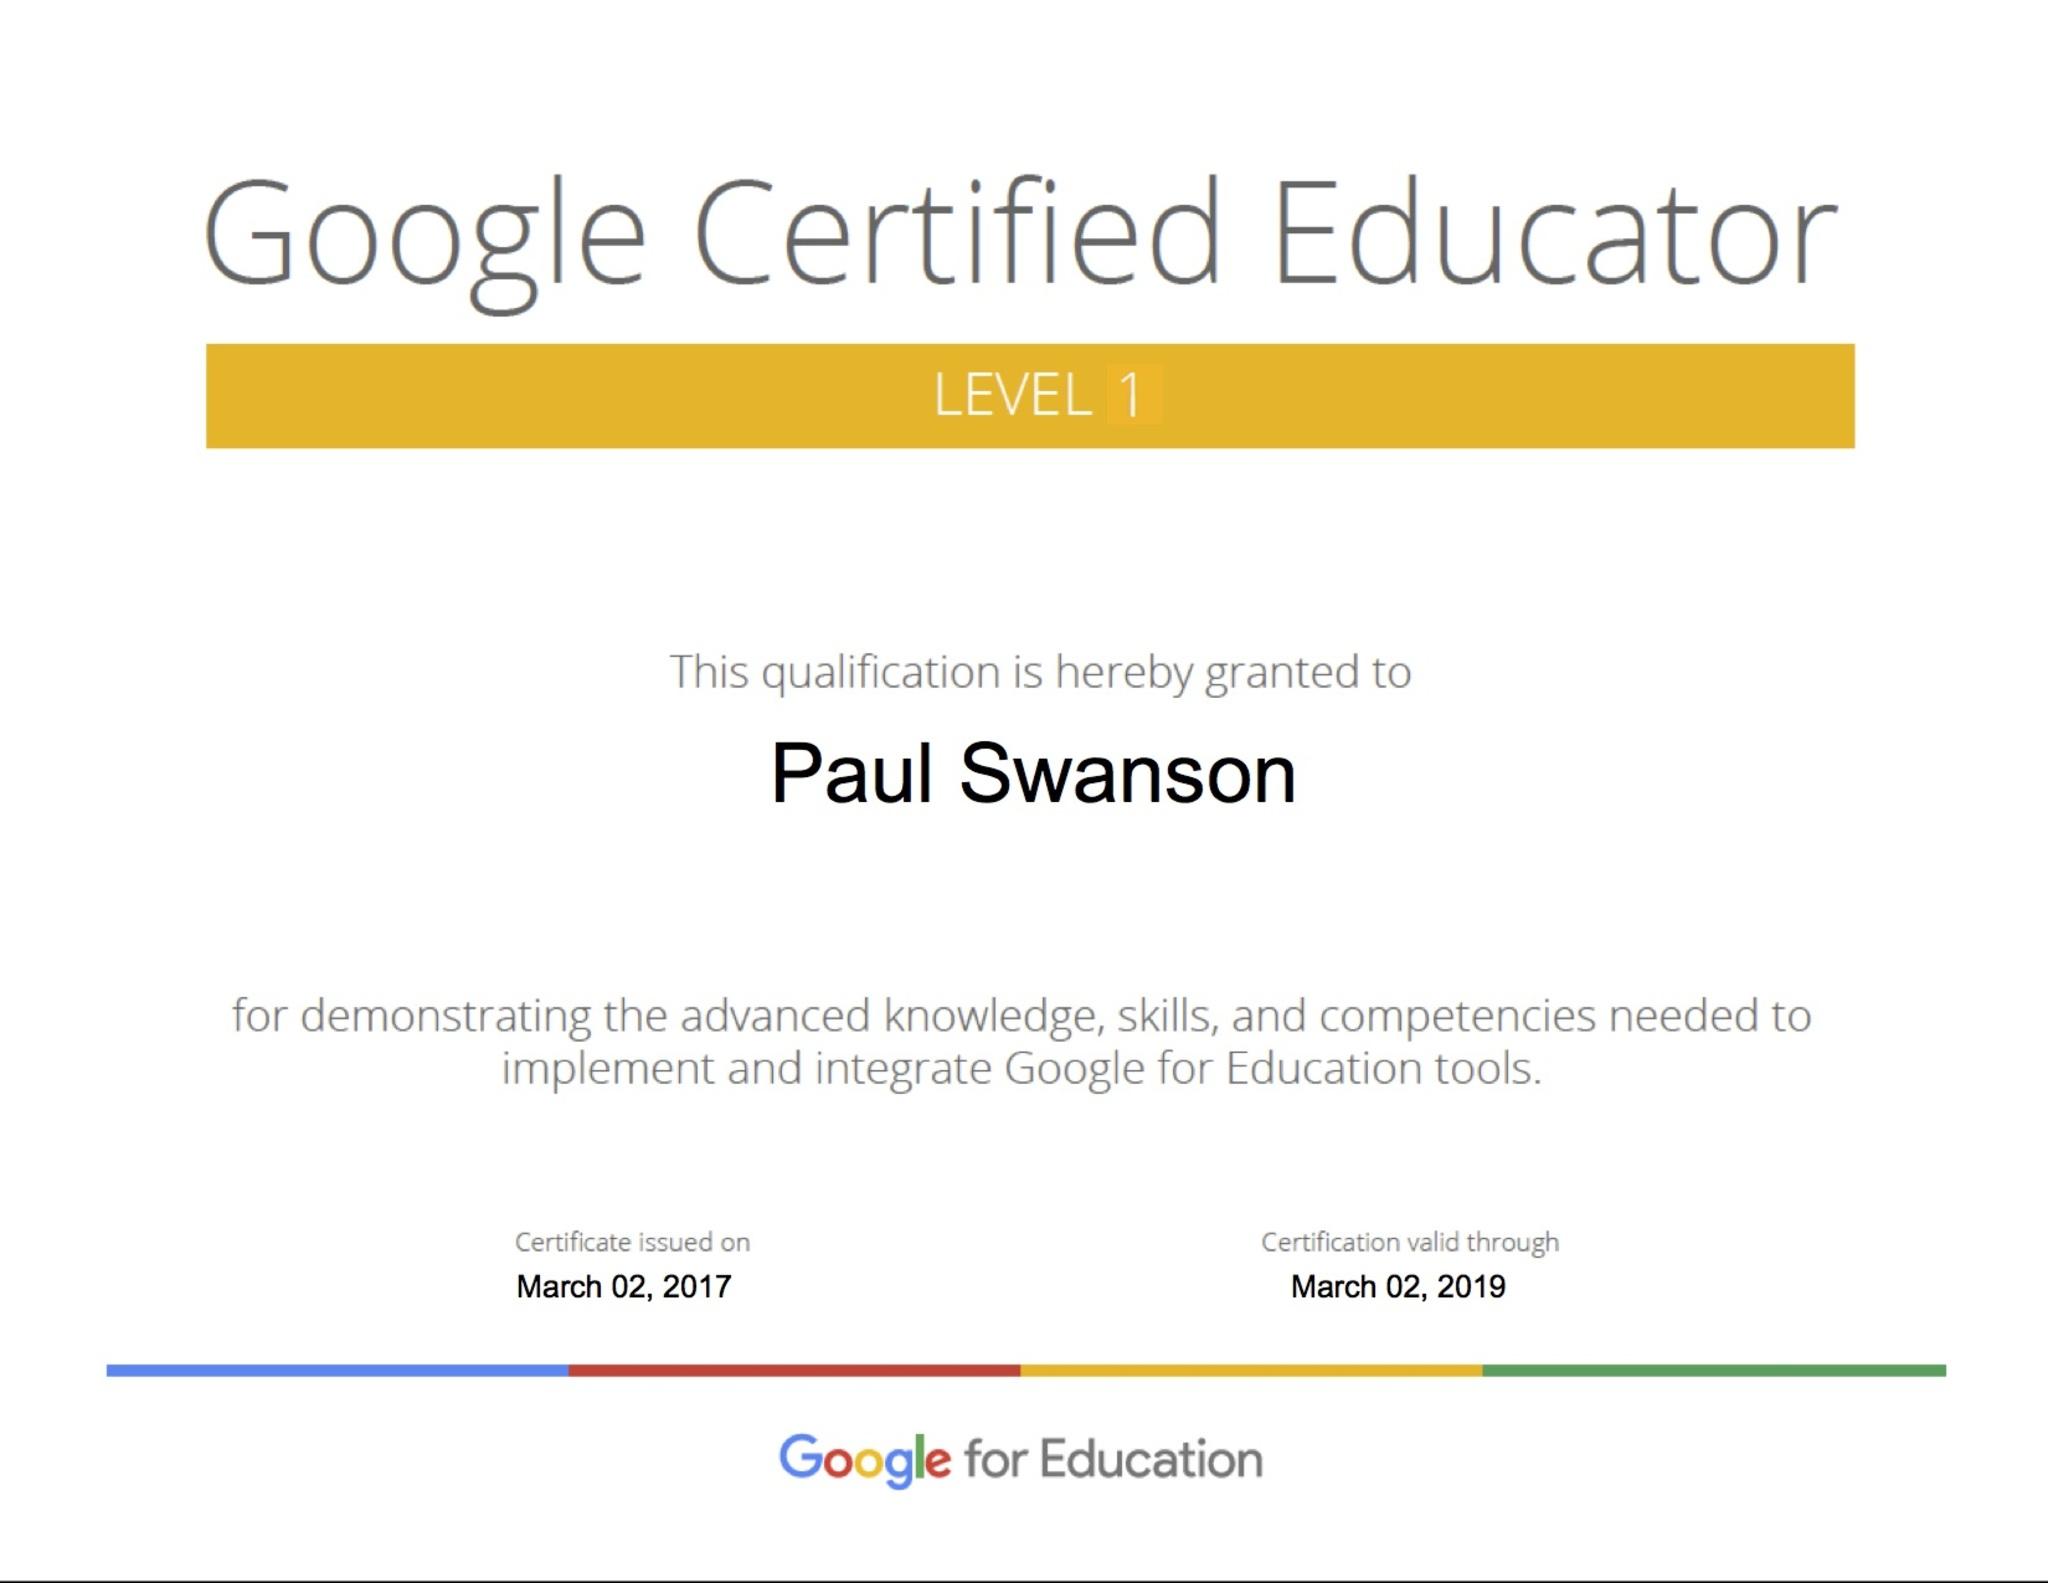 Paul Swanson Google Certified Educator Level 1 Badge List